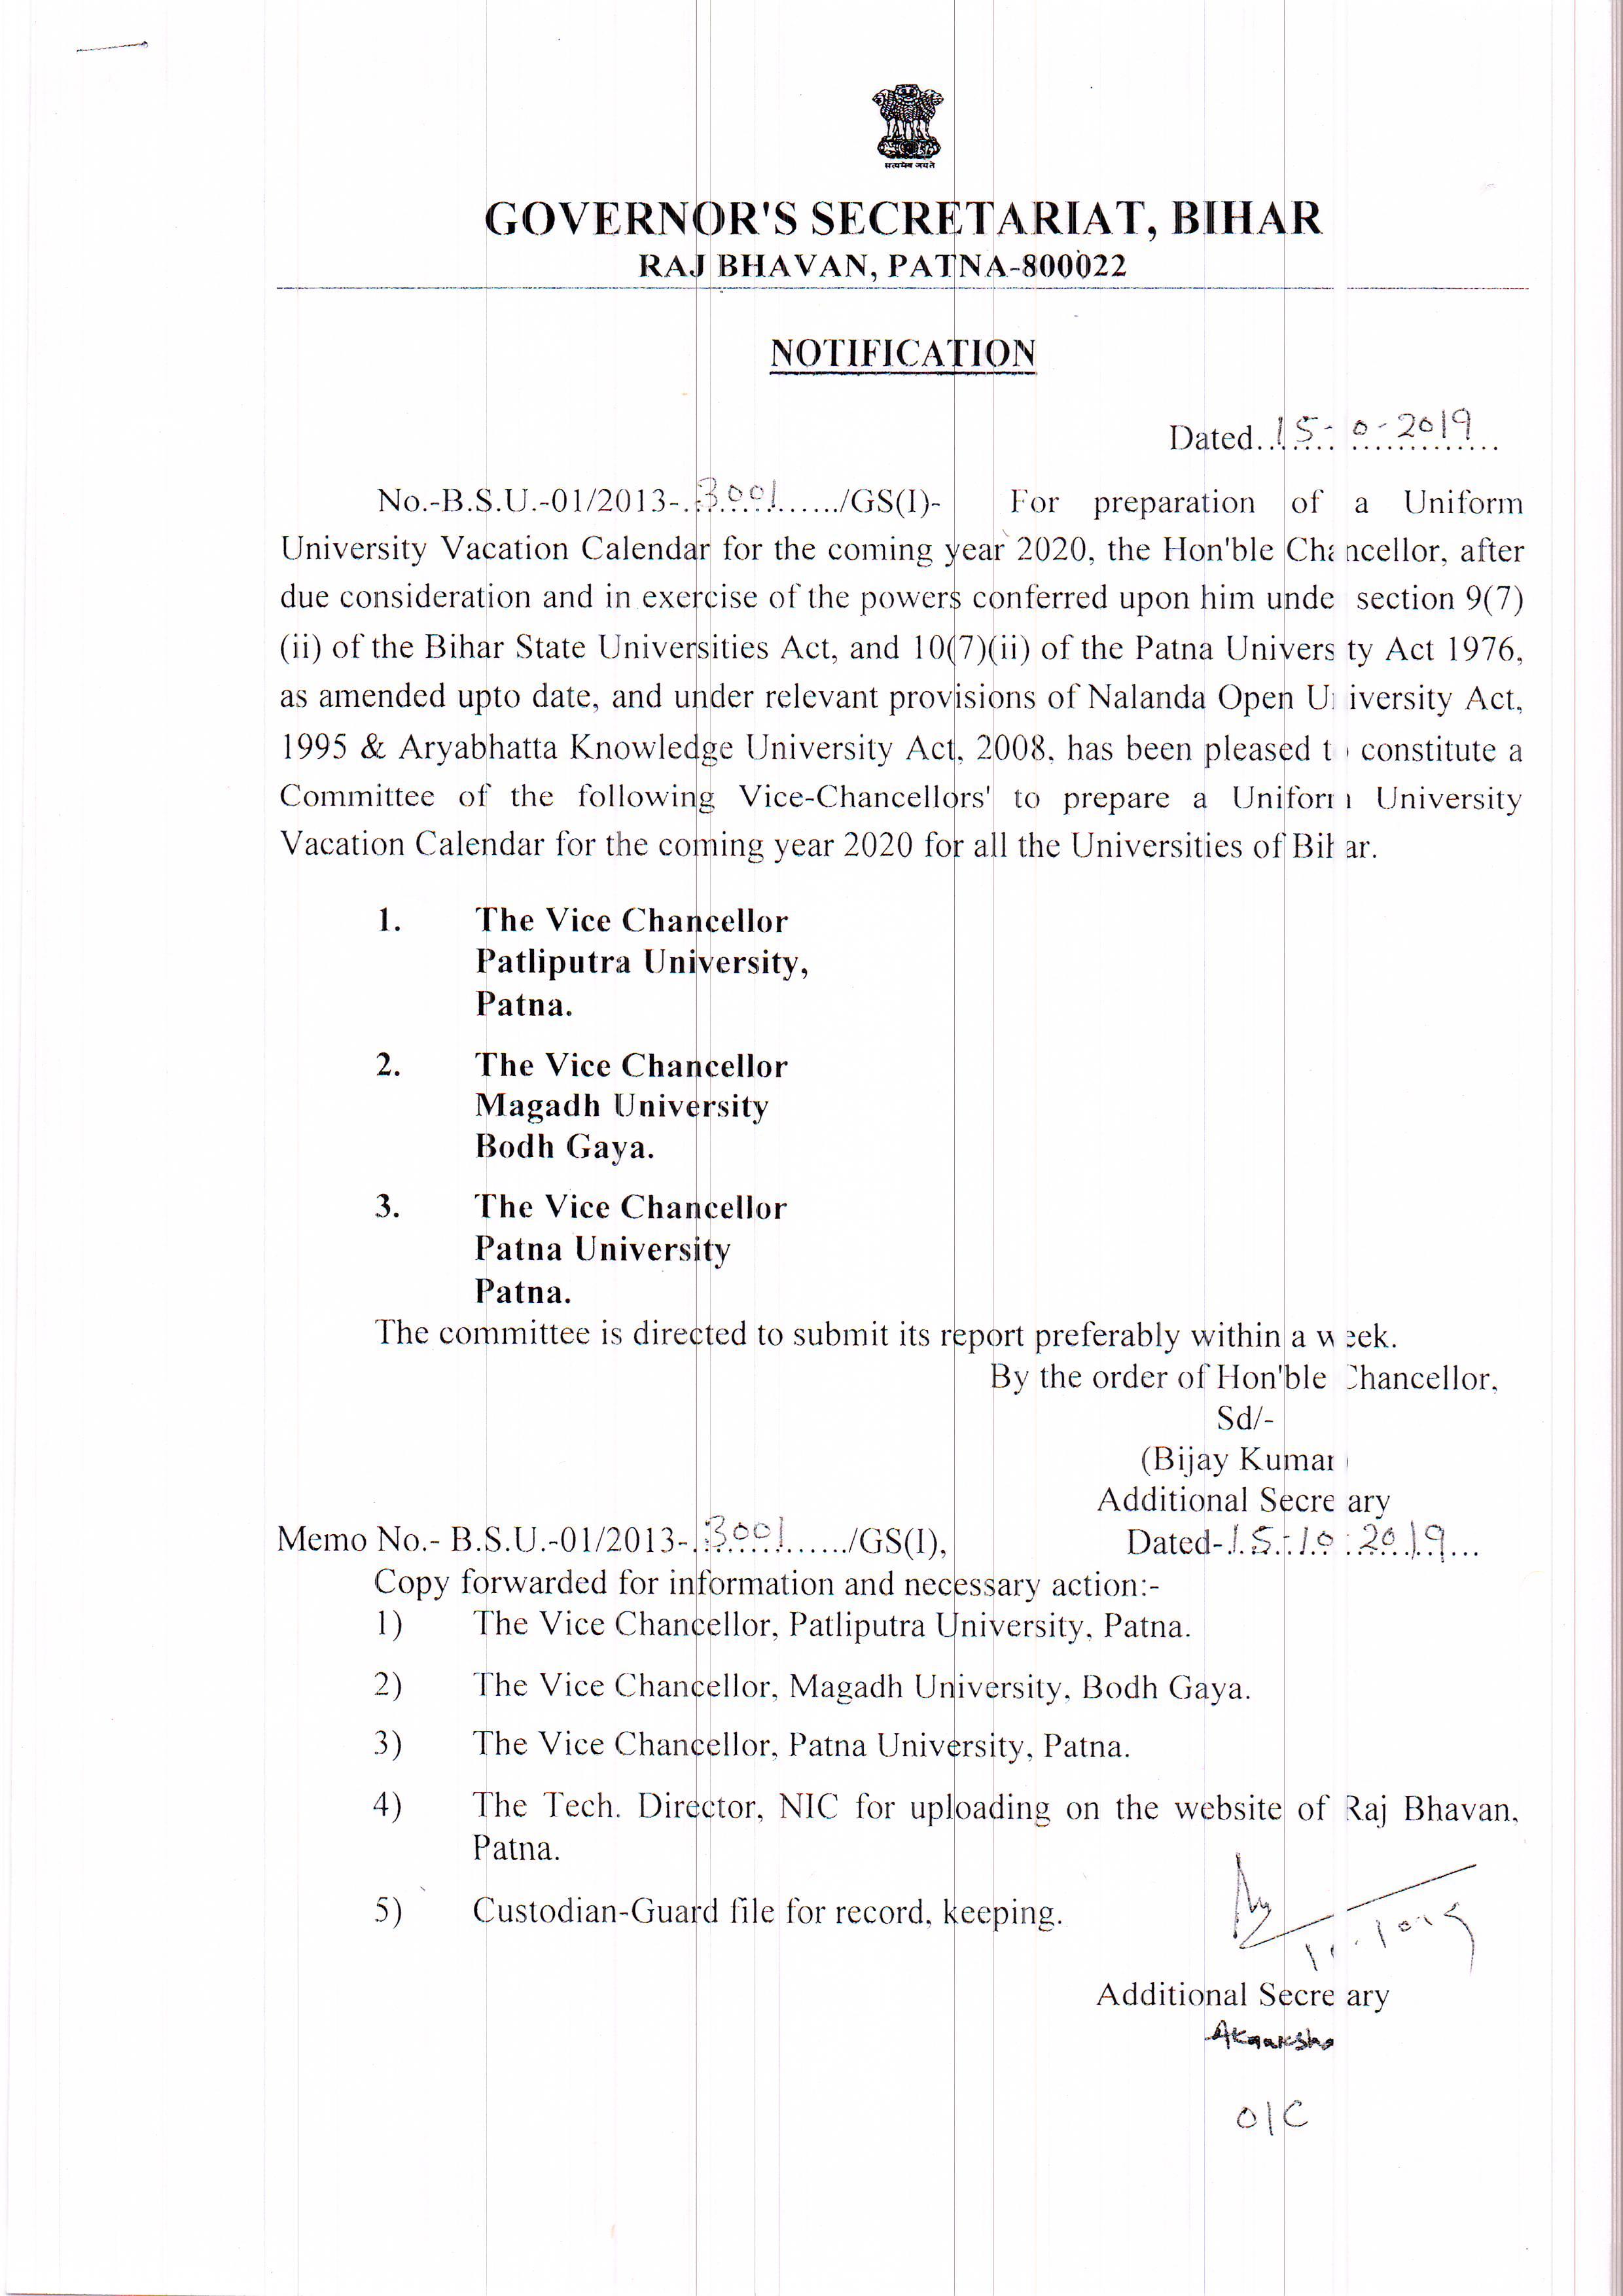 Governor Of Bihar within Bihar Govt. Calendar 2020